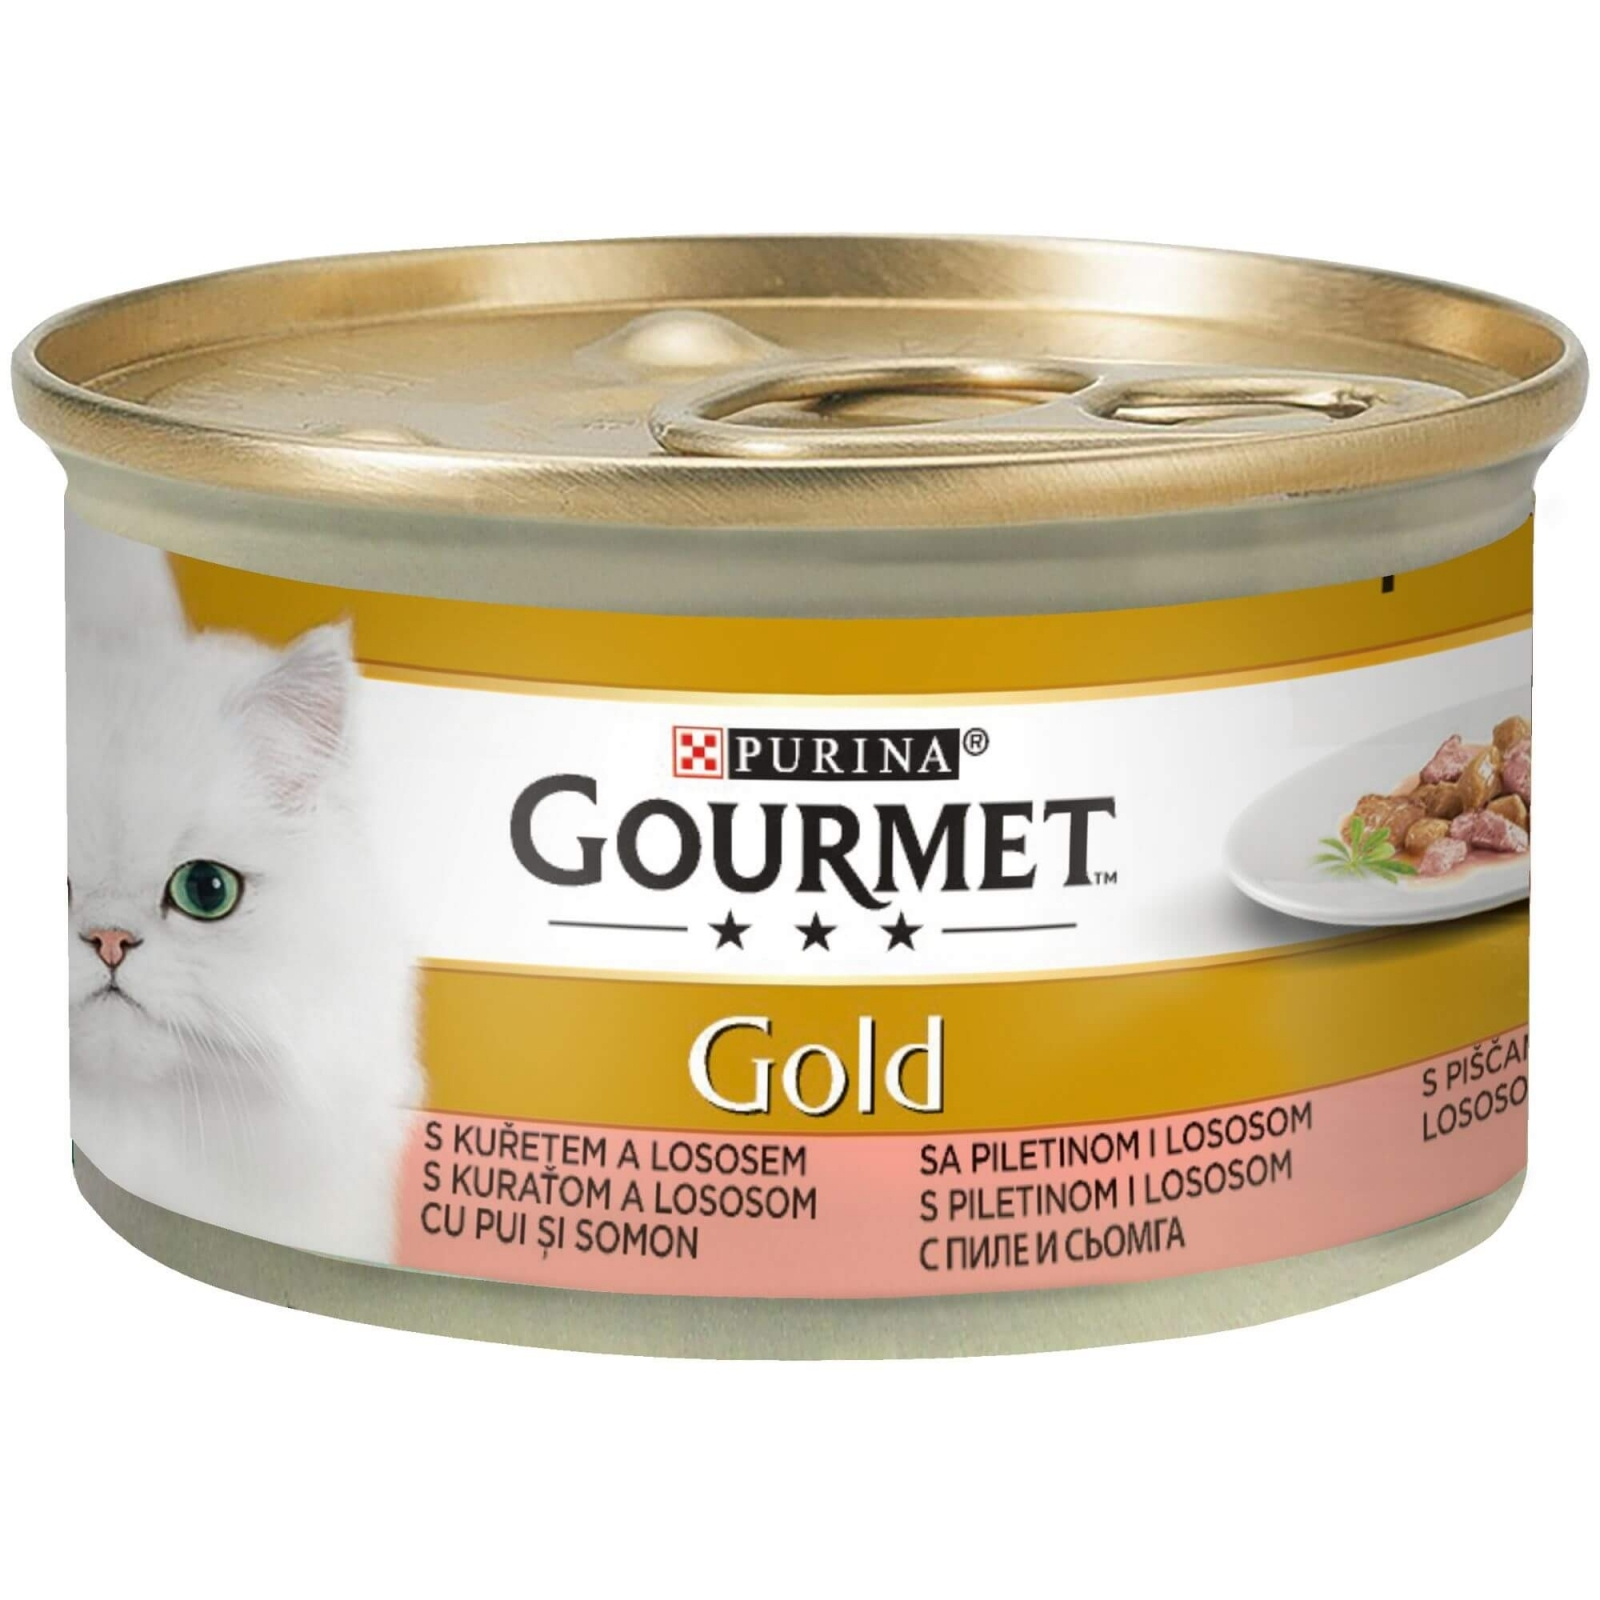 Gourmet Gold Bucatele de Carne in Sos, Pui si Somon, 85 g imagine